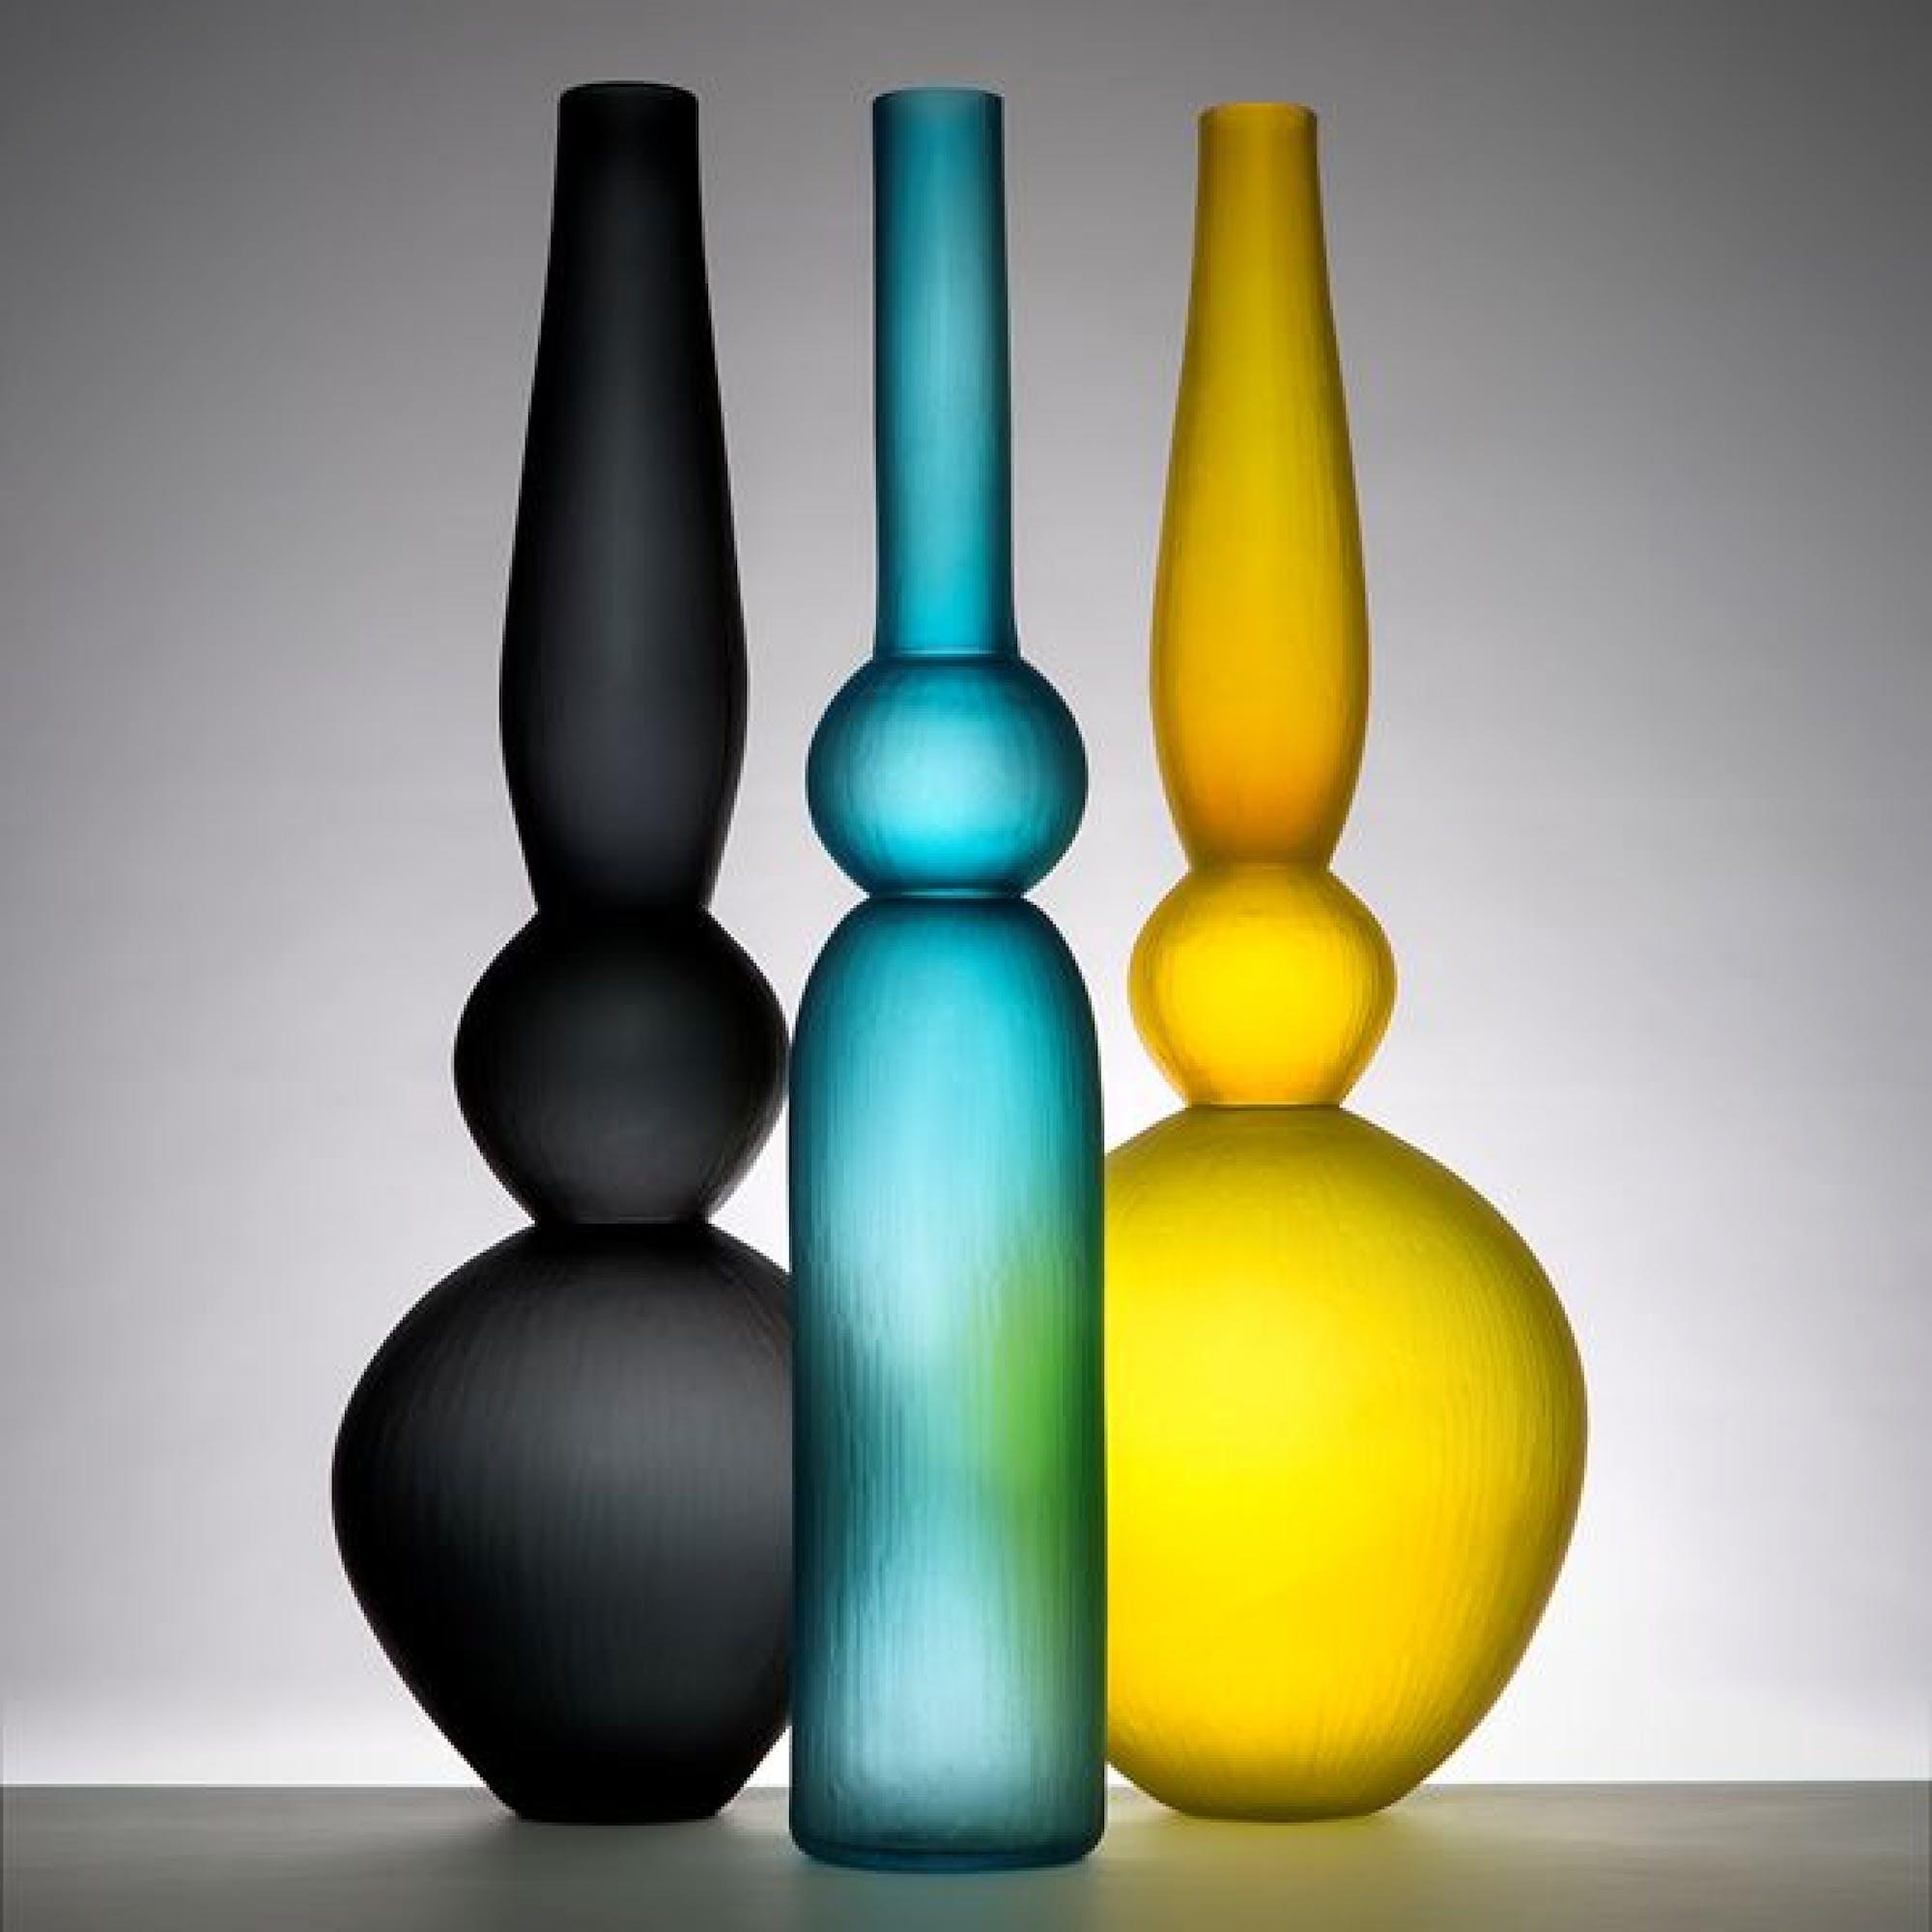 Walpole Editorial The Value of Craftsmanship Part 4: Simon Moore by Lisa Grainger